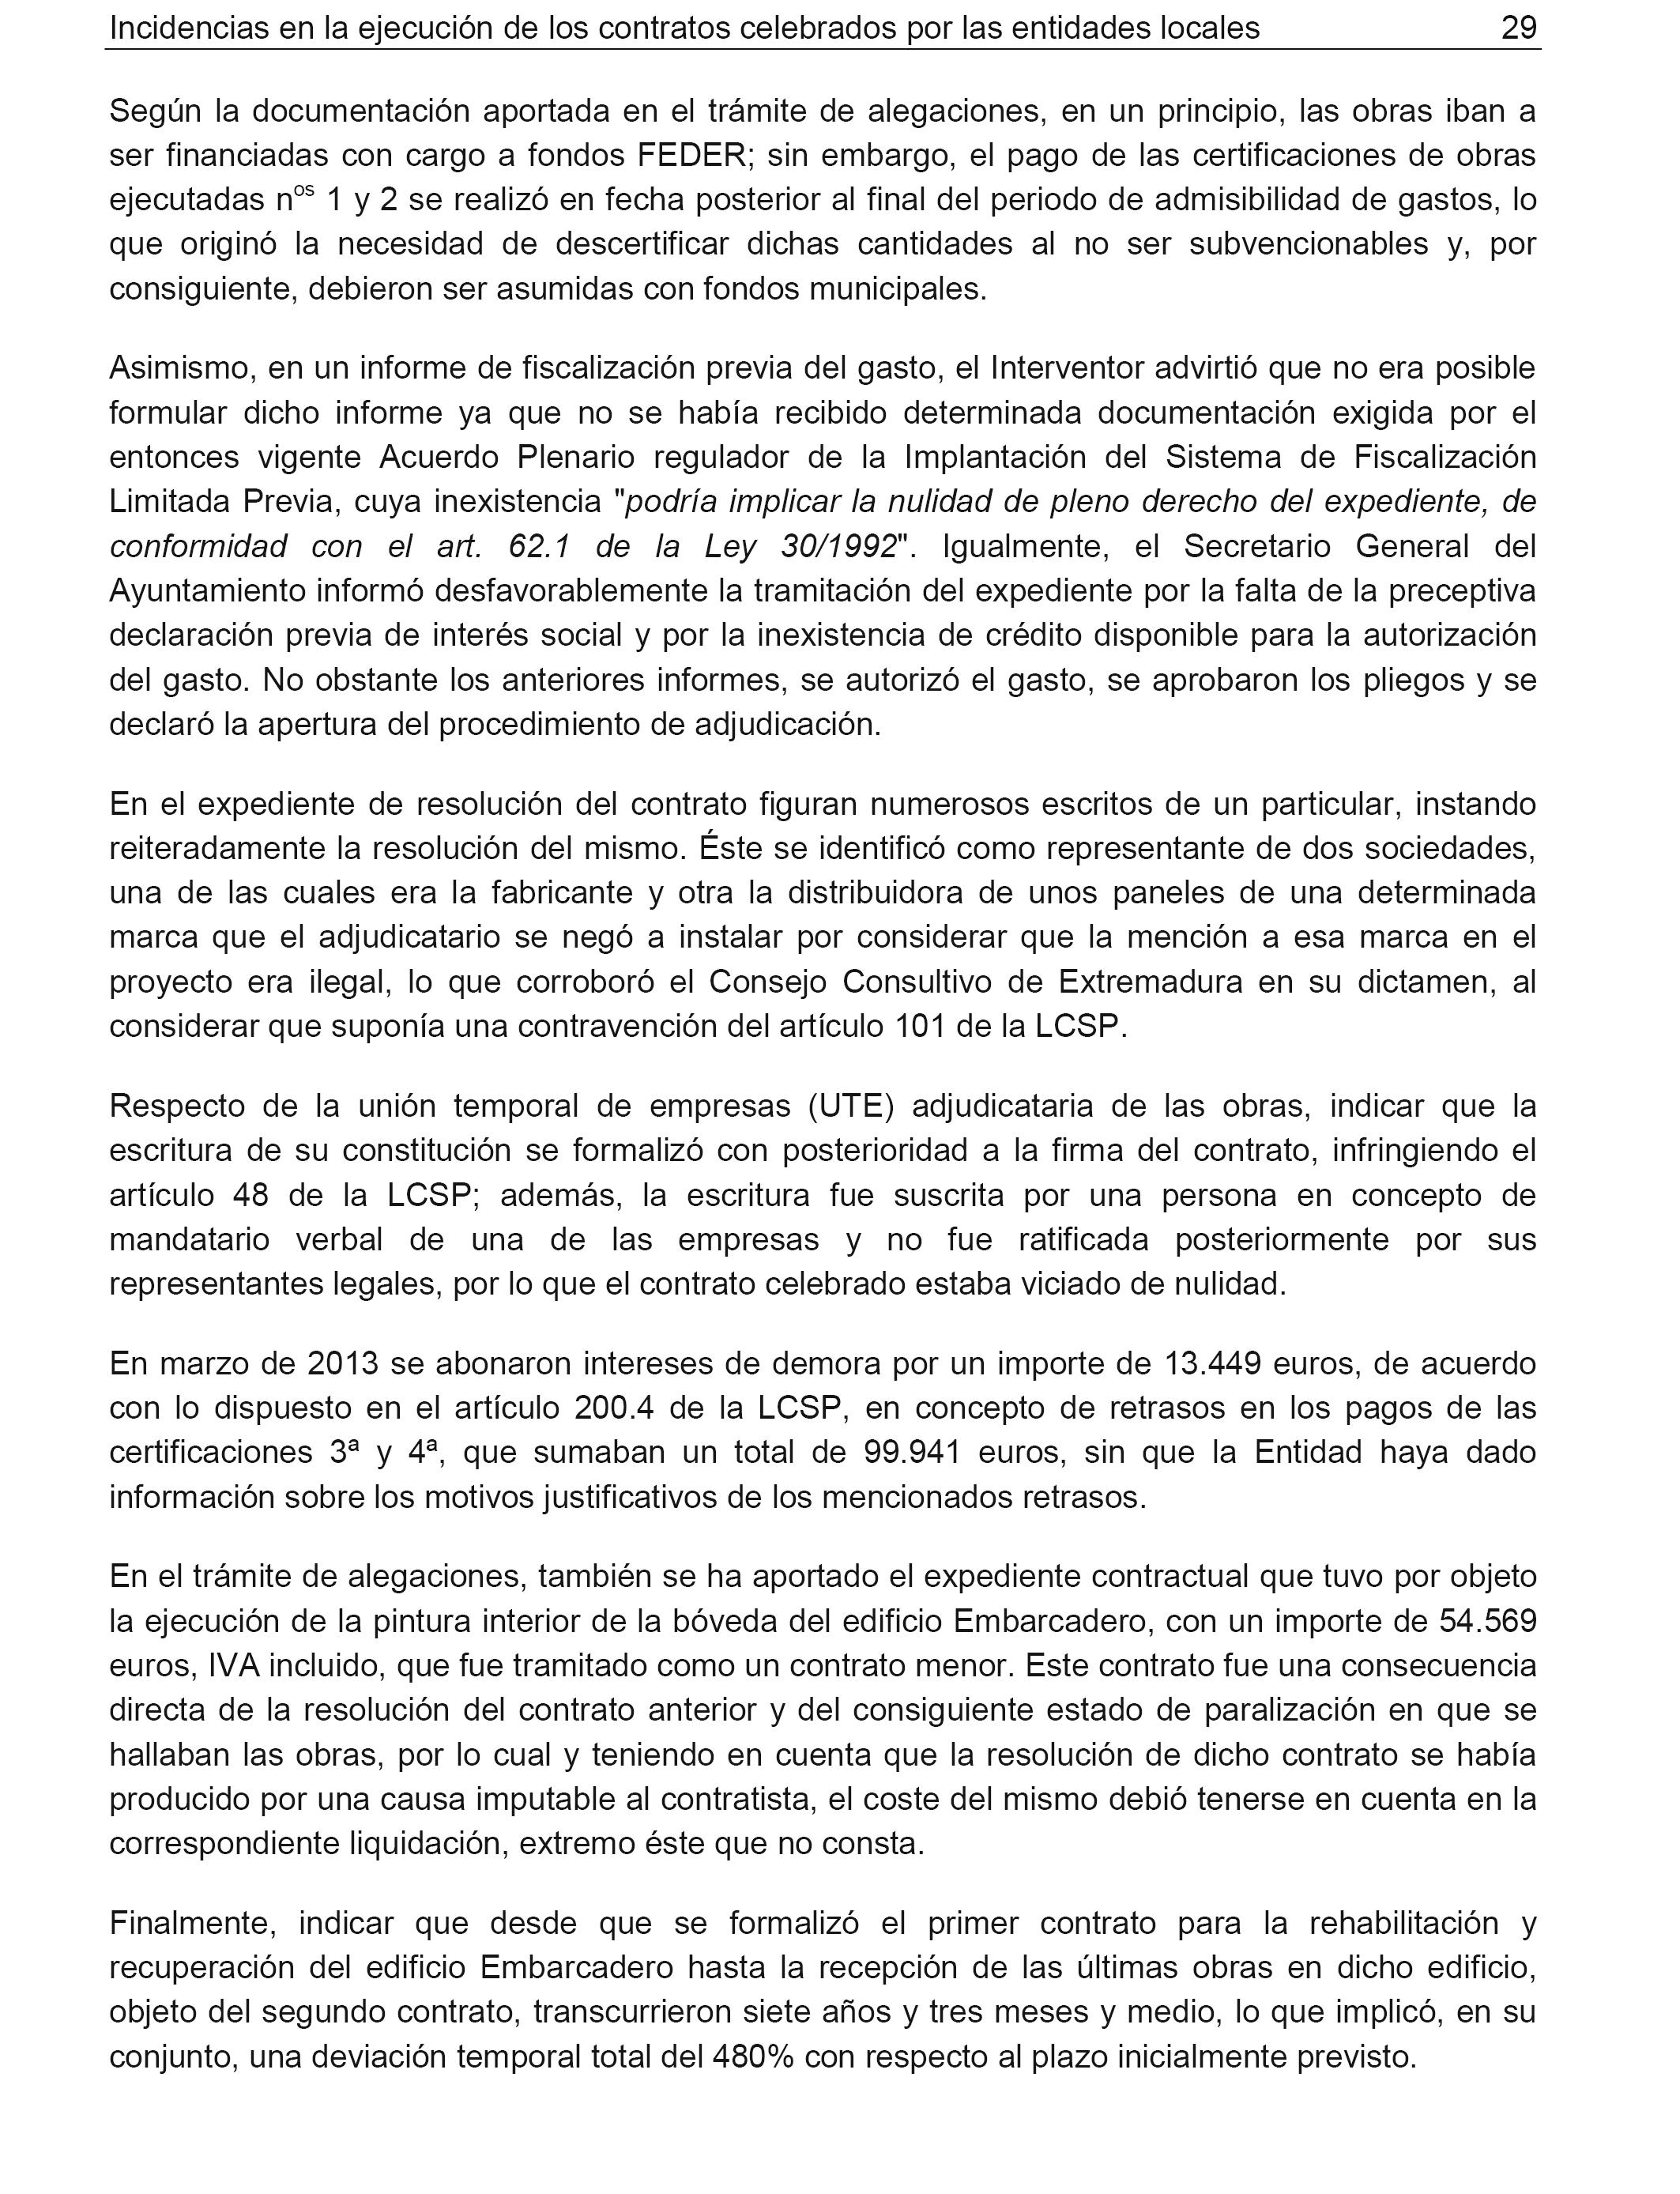 BOE.es - Documento BOE-A-2017-3245